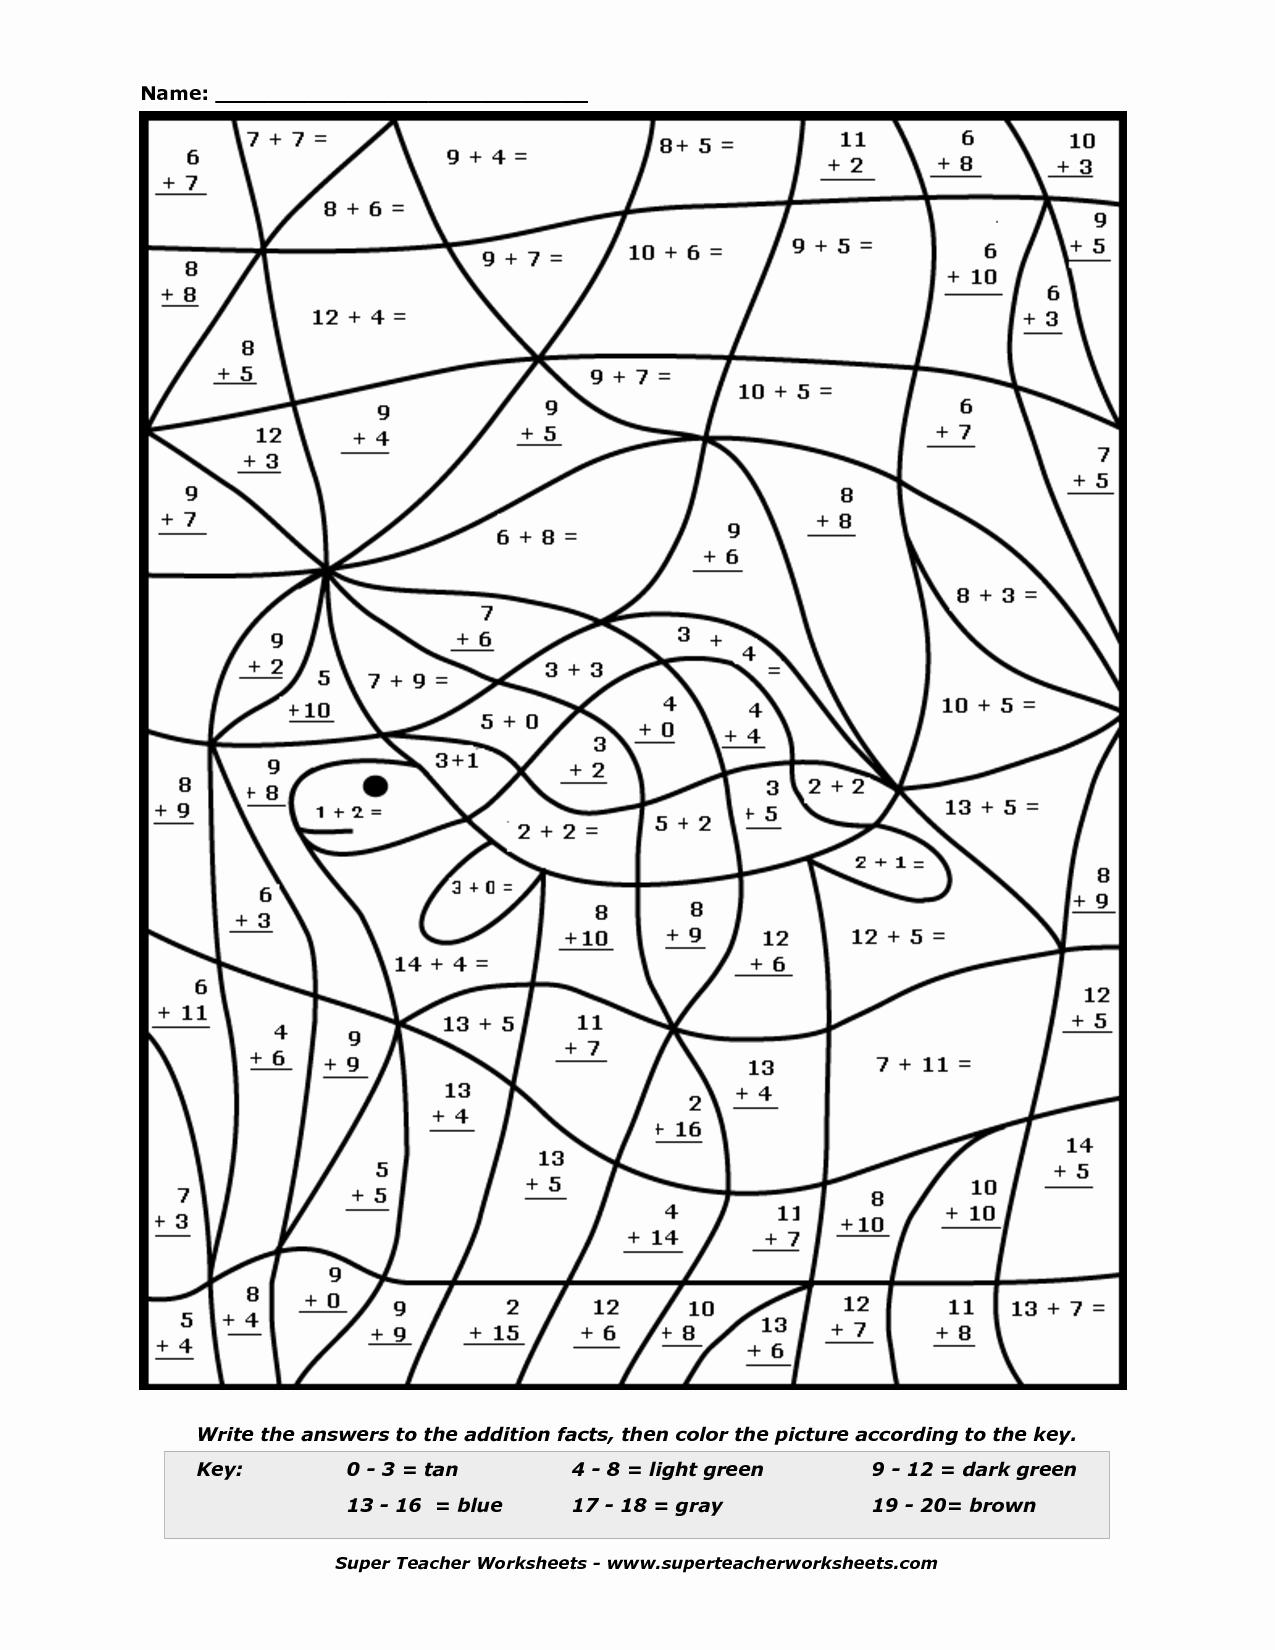 Coloring Addition Worksheet Fresh 15 Best Of Super Teacher Worksheets Coloring Pages